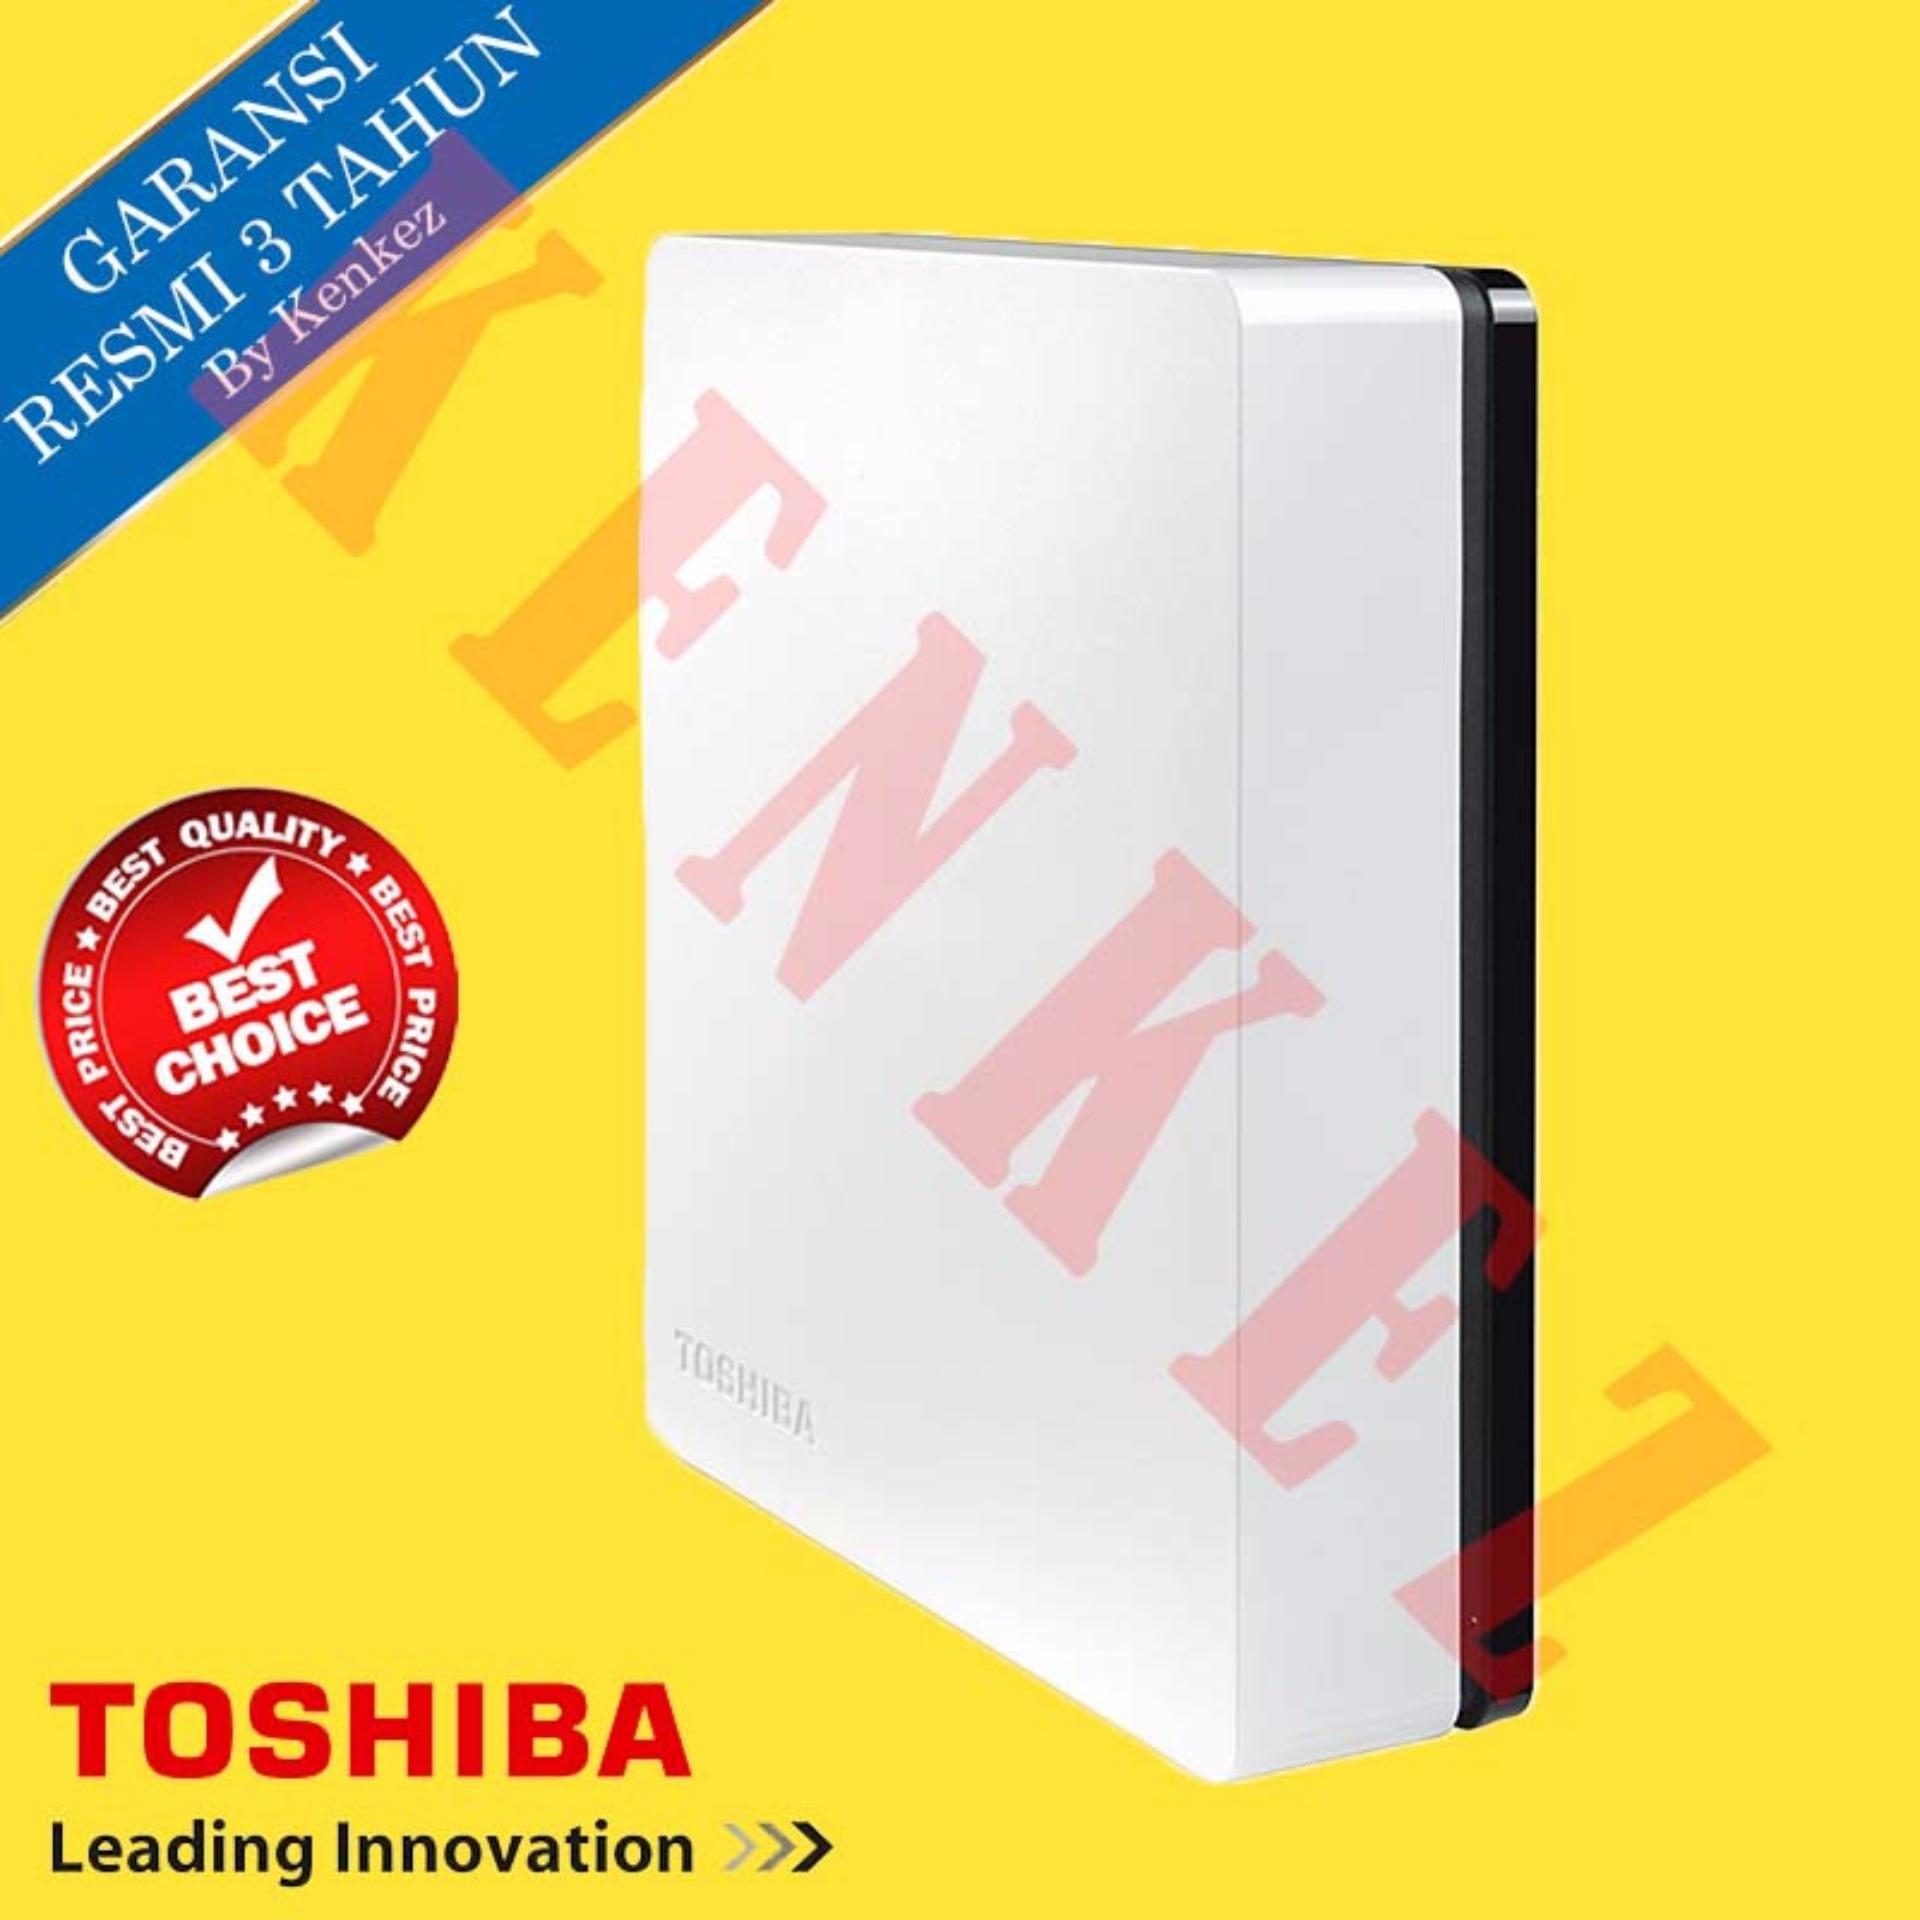 Seagate Backup Plus Slim 4tb Hdd Hd Hardisk External 25 Silver Expansion Desktop 35 Inch Eksternal Usb 30 With Power Adaptor Toshiba Canvio Desk 3tb